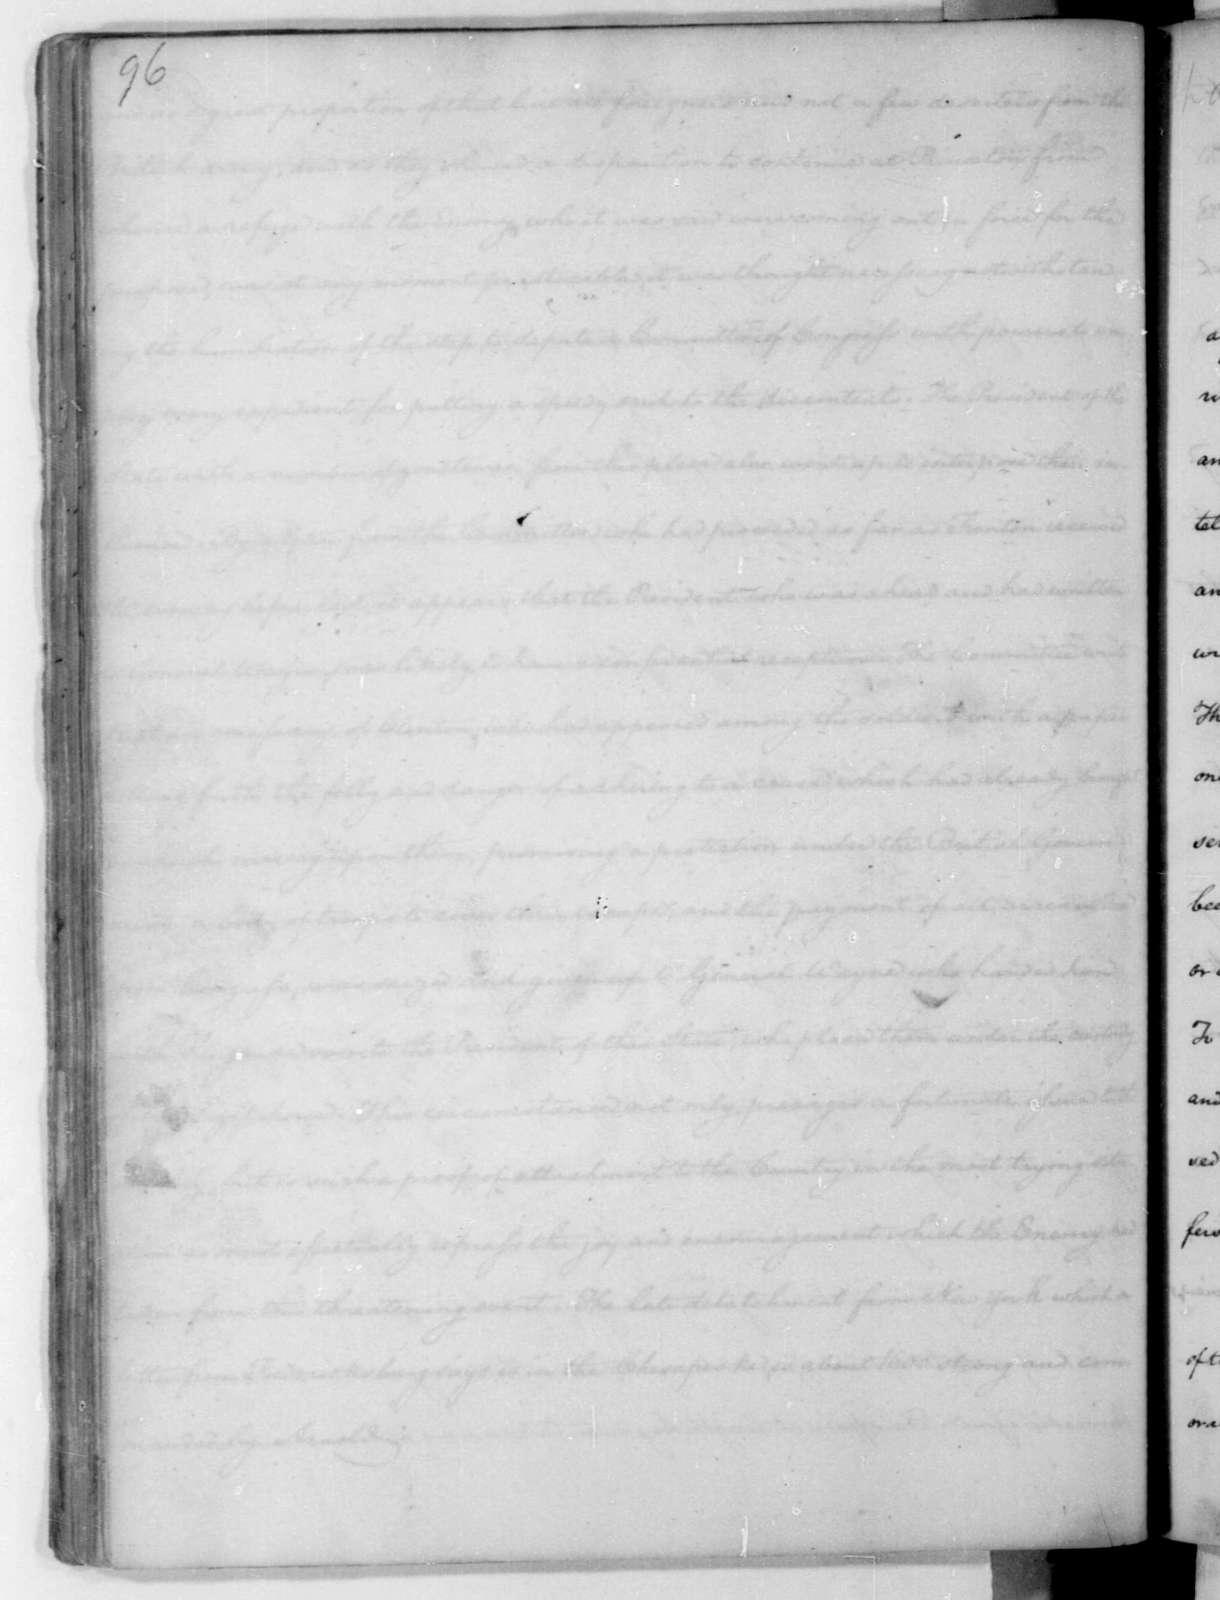 James Madison to Edmund Pendleton, January 9, 1781.